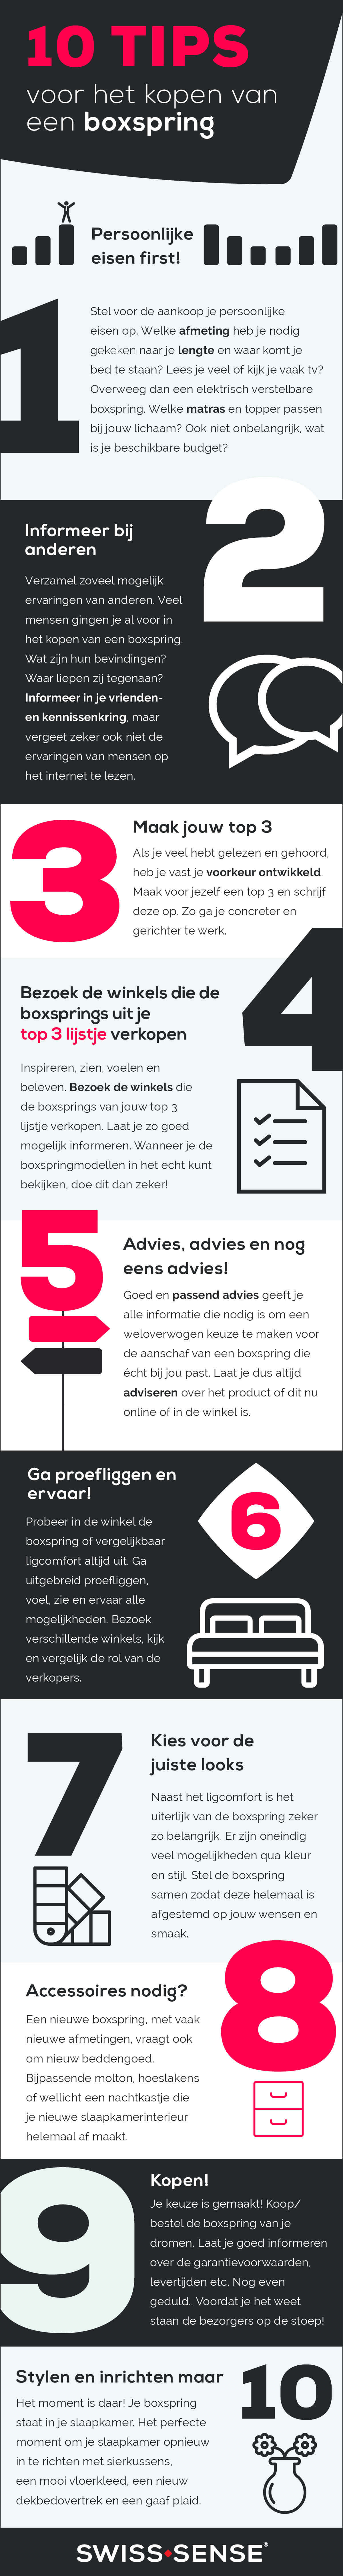 10 Tips Boxspring Kopen Infographic   Swiss Sense